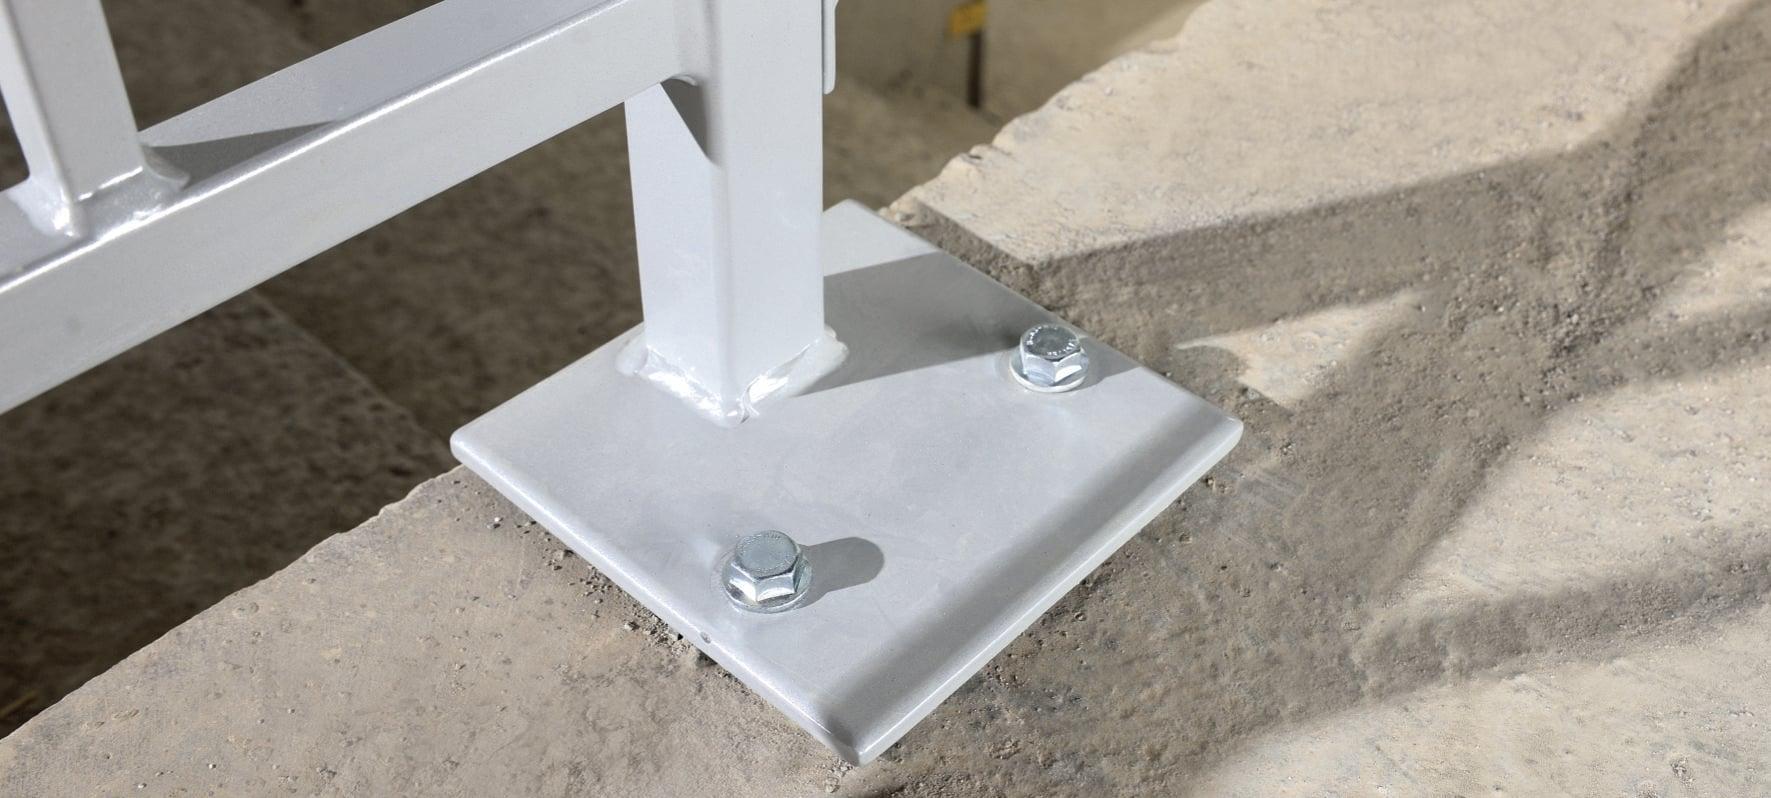 KH-EZ 3//8 x 3-418057 Hilti Kwik HUS-EZ Concrete and Masonry Screw Anchor Carbon Steel Box of 50